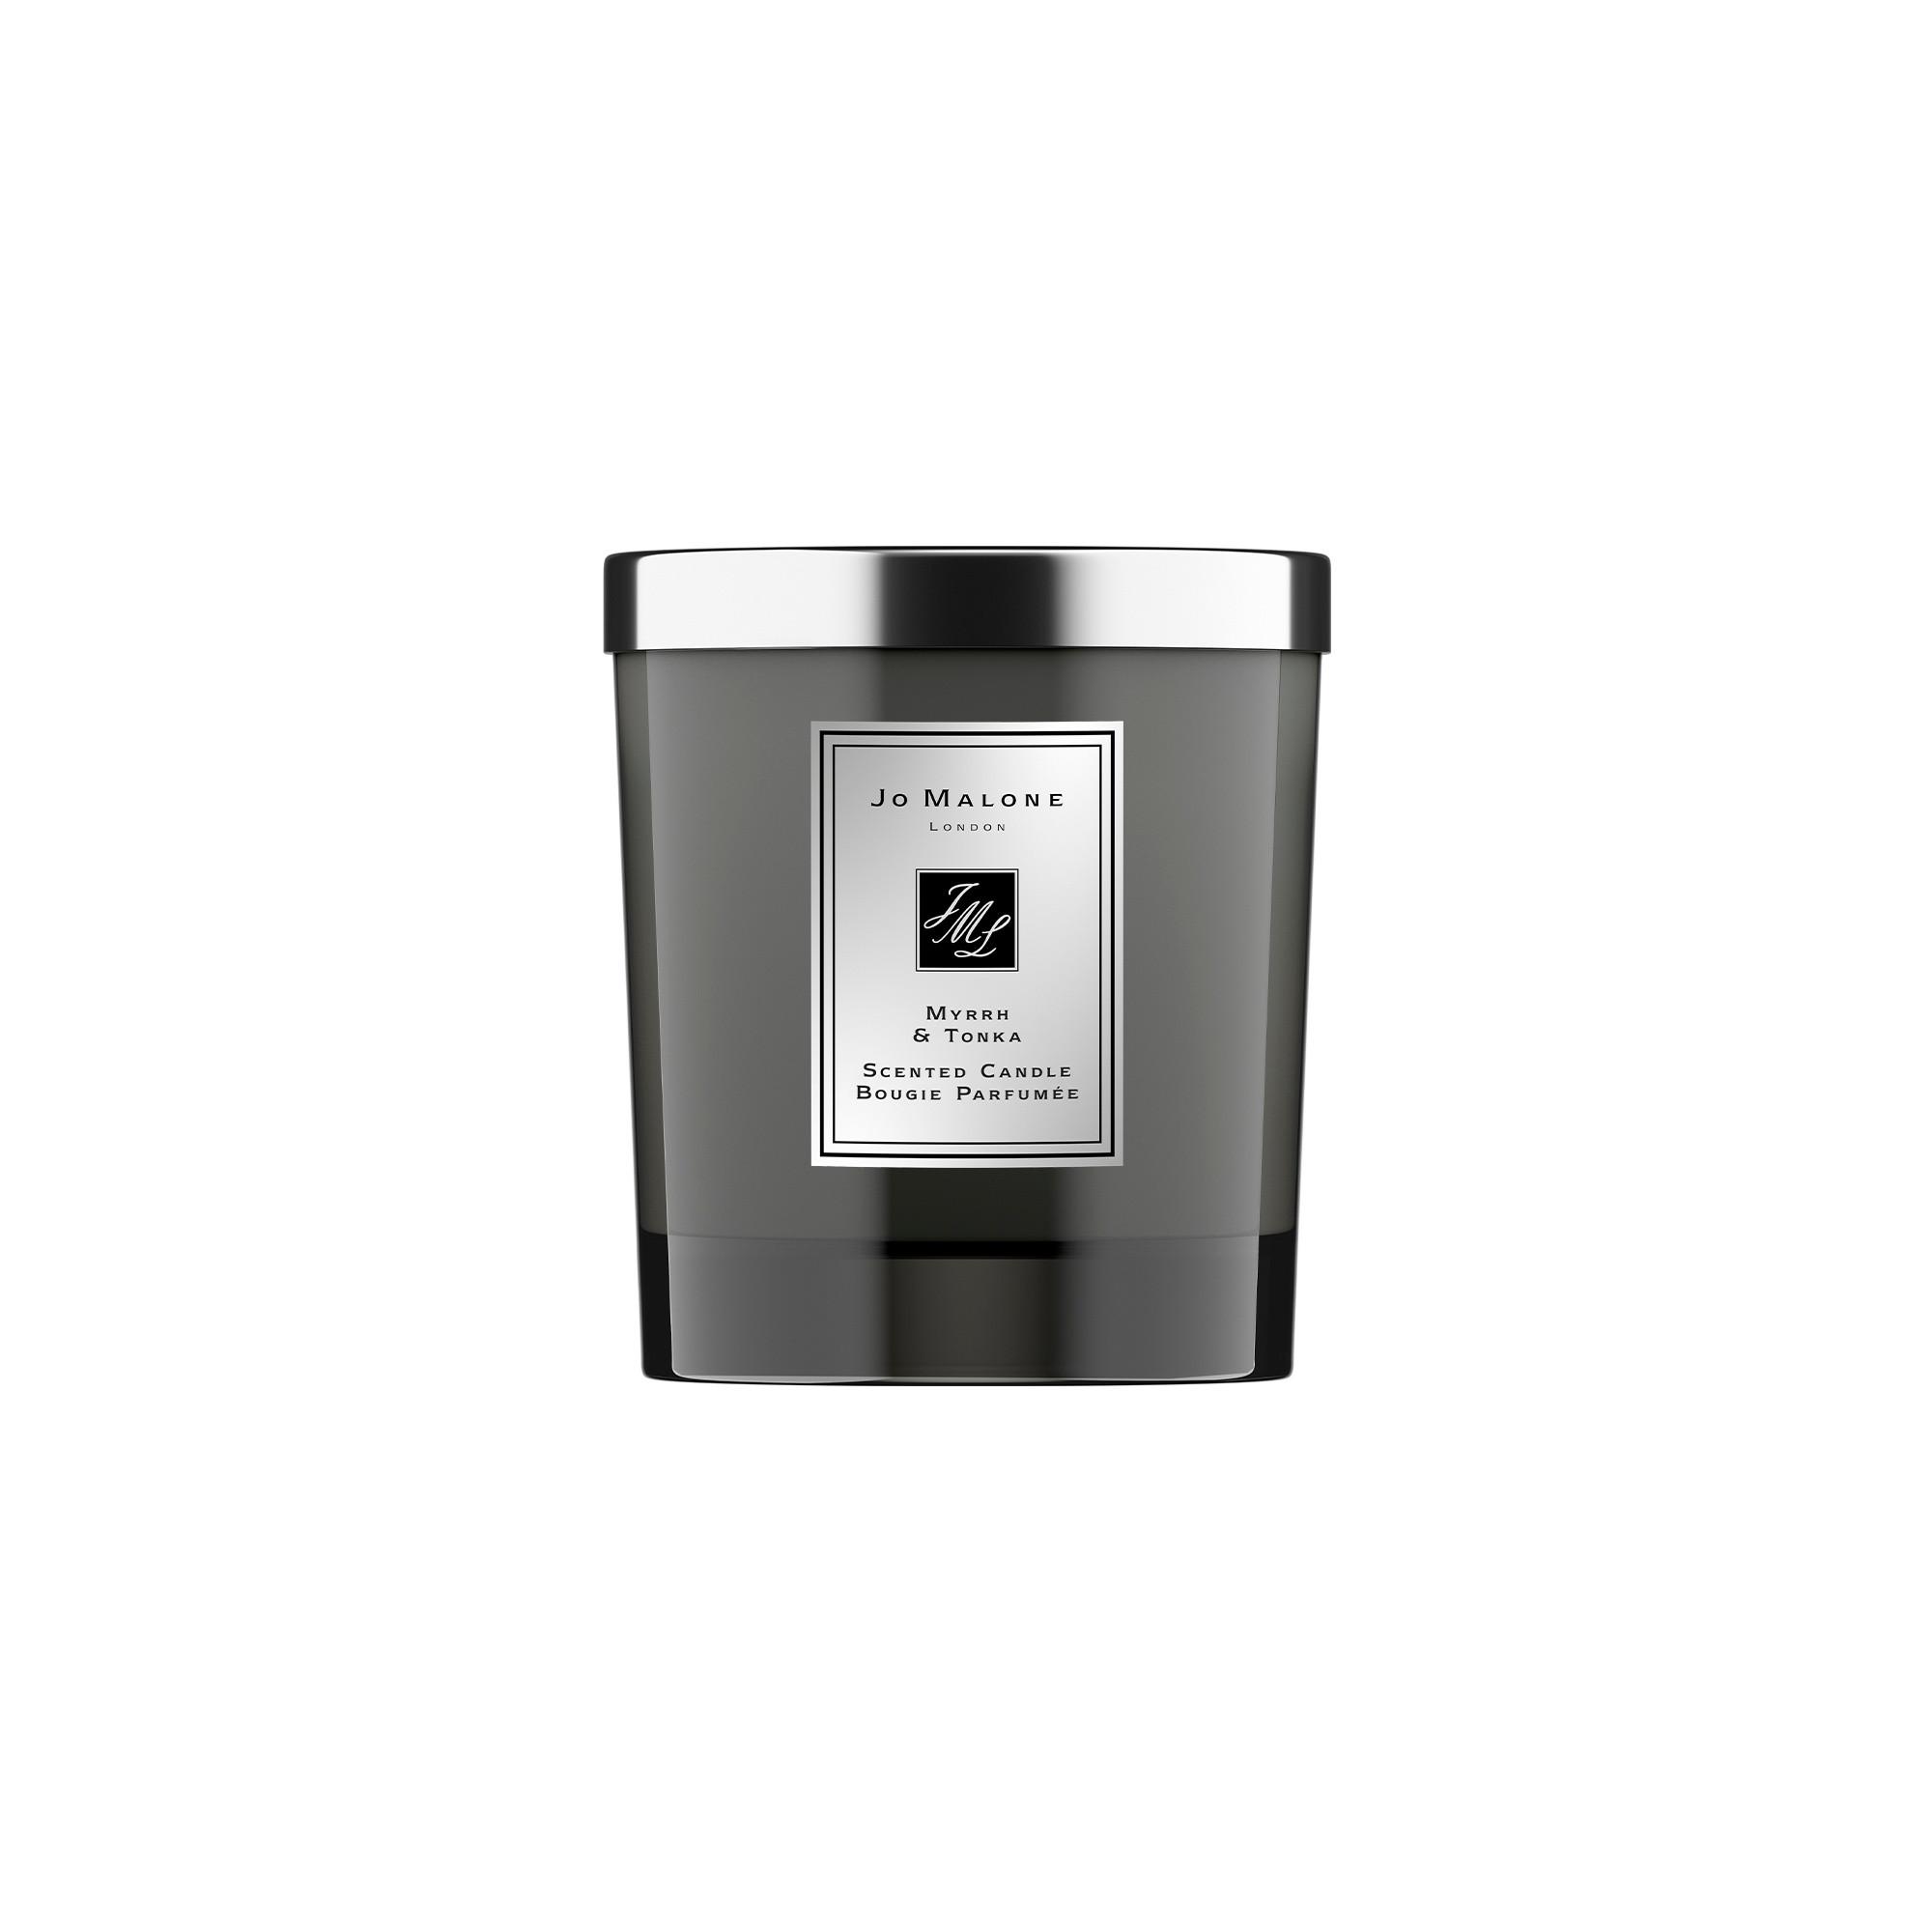 Jo Malone London myrrh & tonka home candle 200 gr, Nero, large image number 0